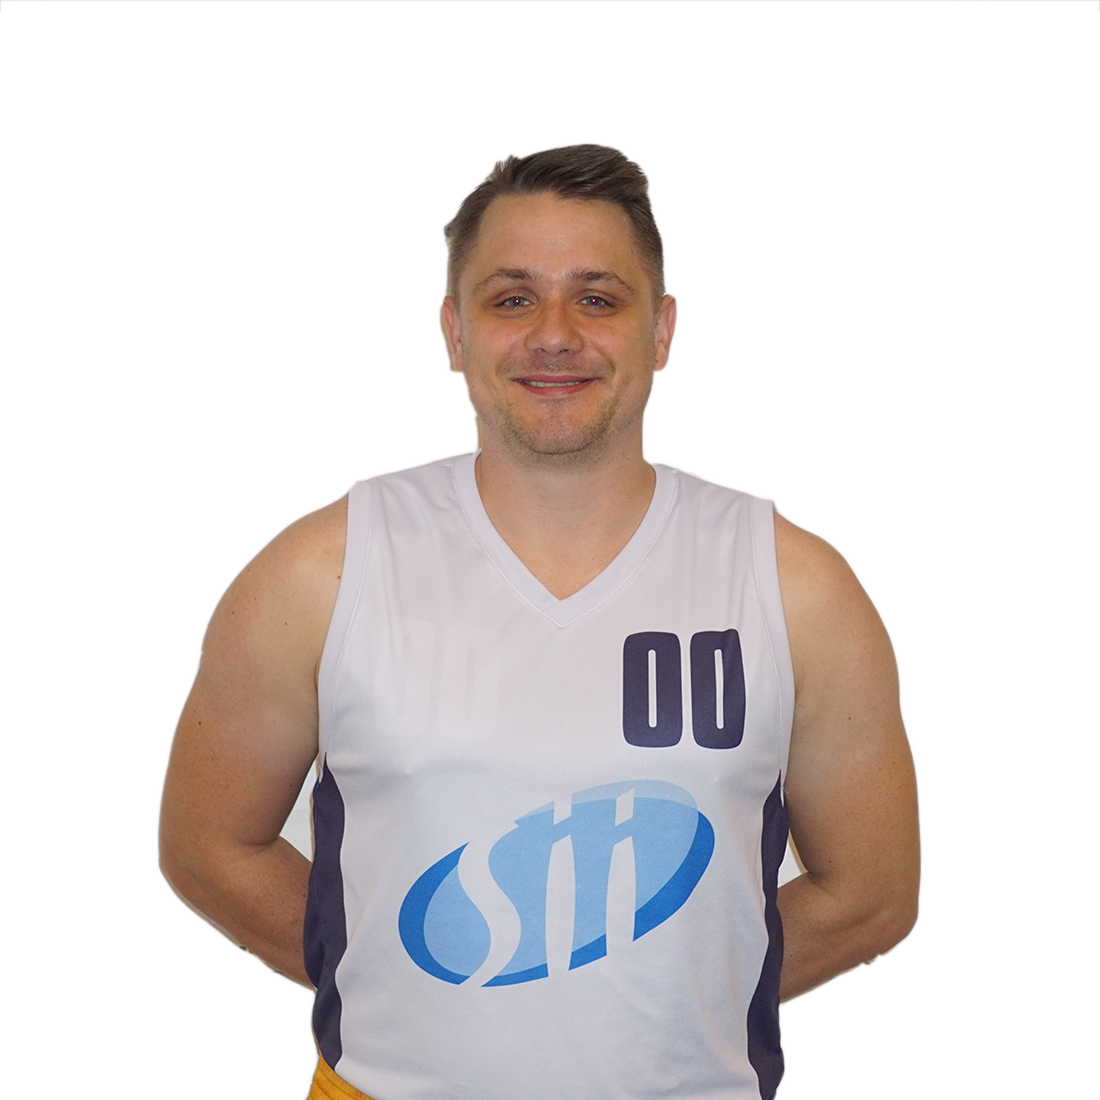 Jakub Jakubowski